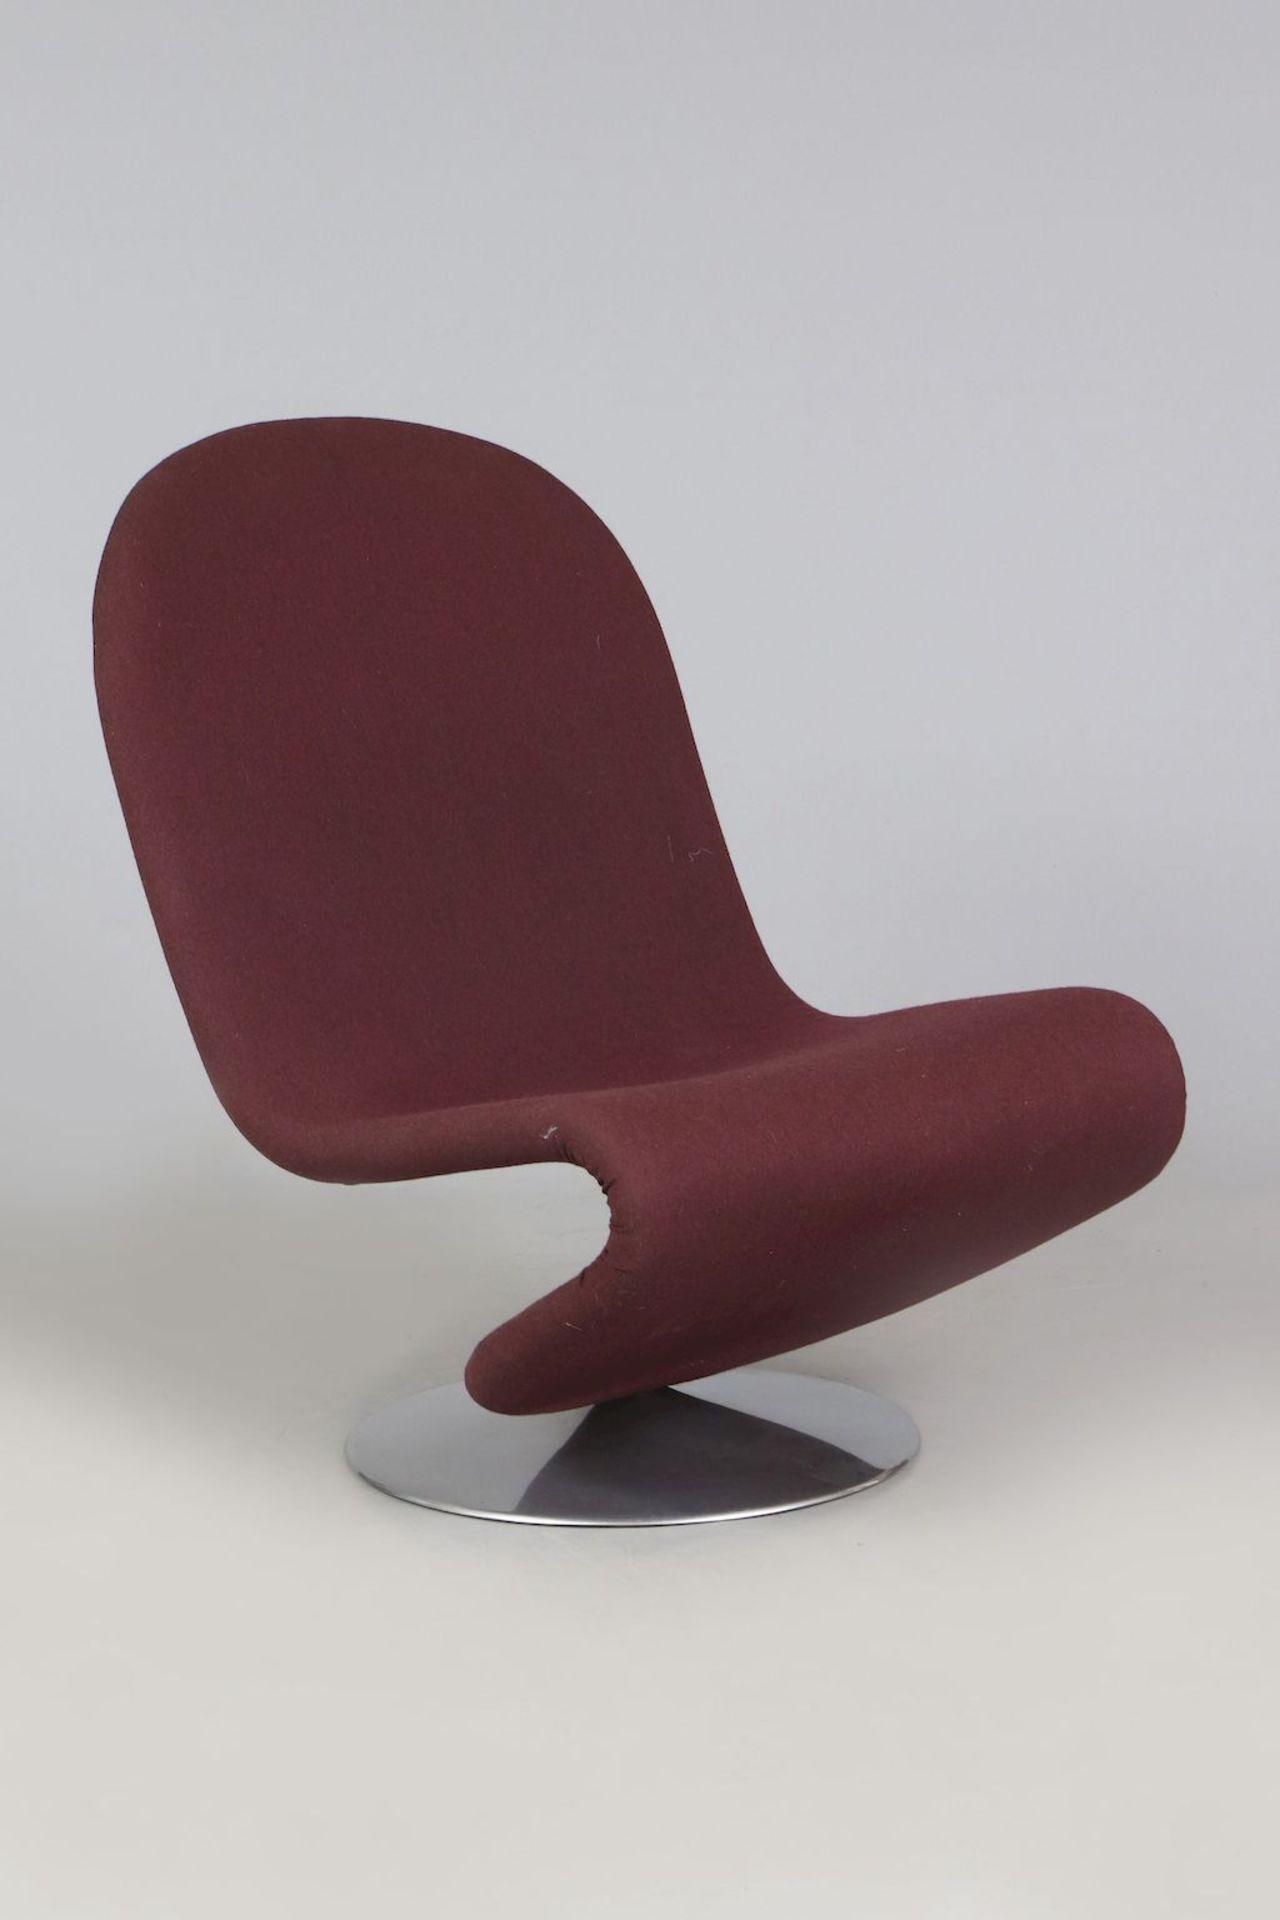 VERNER PANTON 1-2-3 Lounge Chair